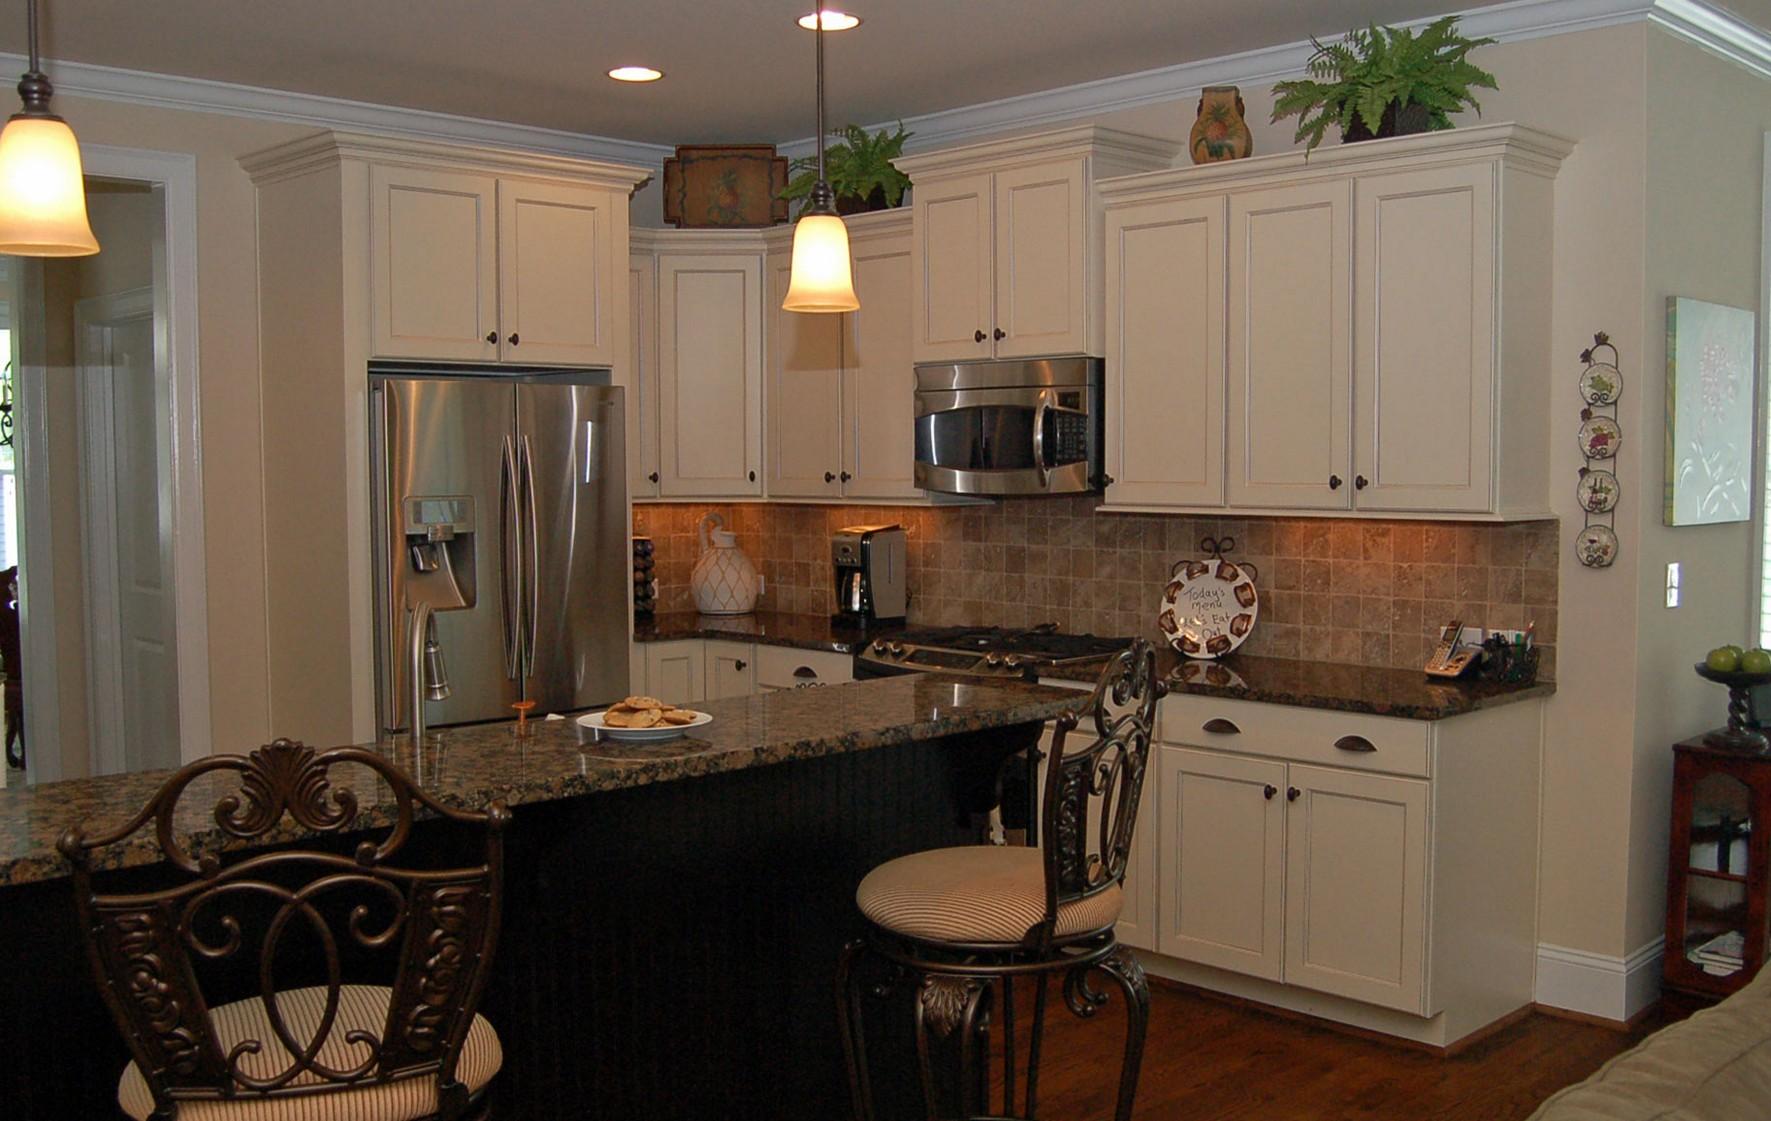 kitchen-white-cabinets-dark-countertops-photo-16